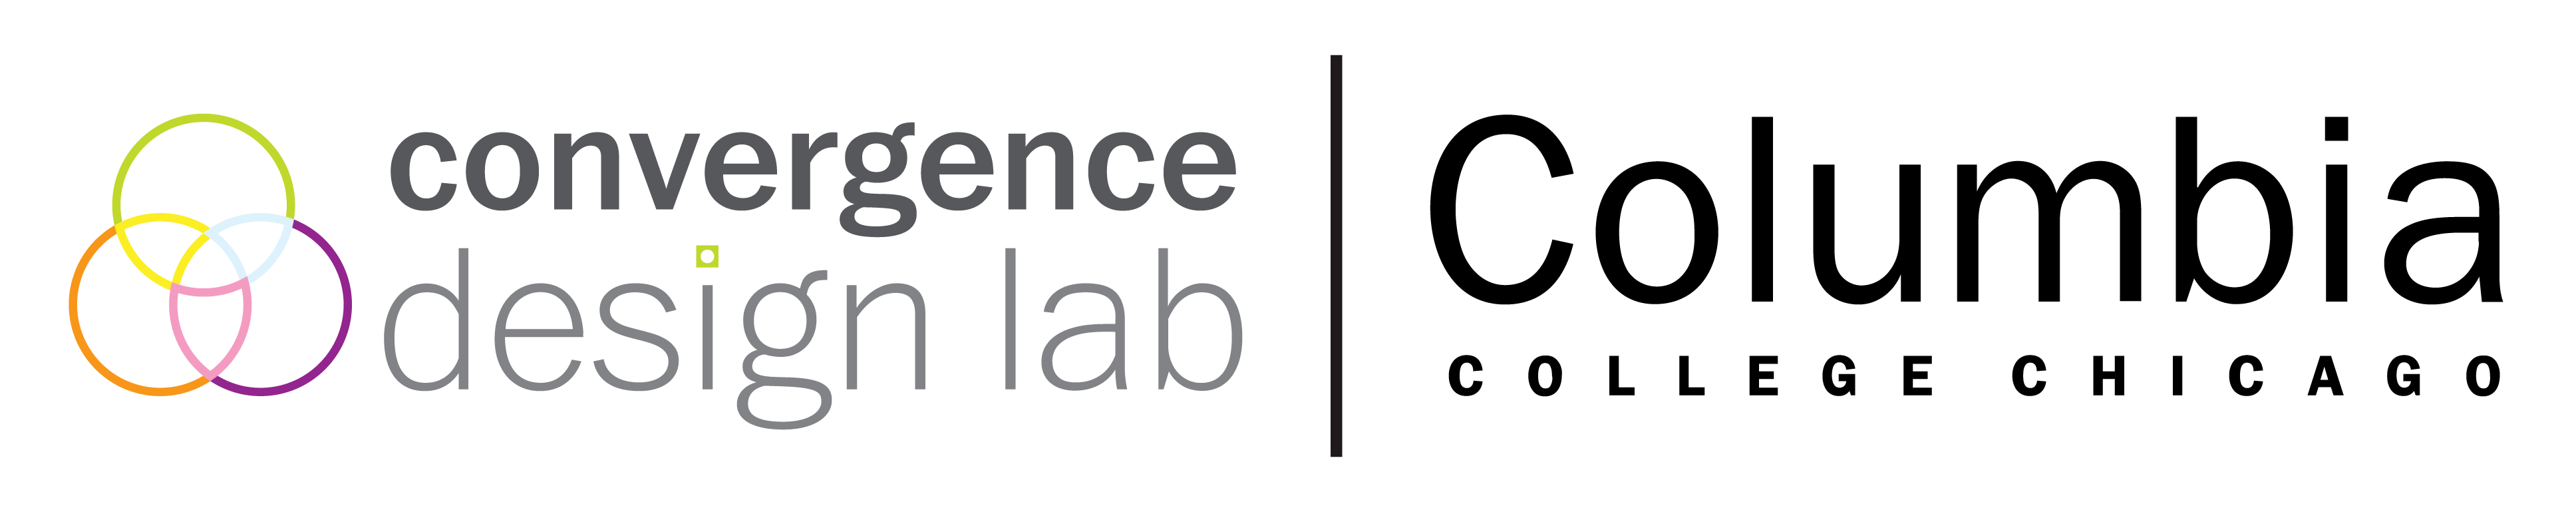 Convergence Design Lab